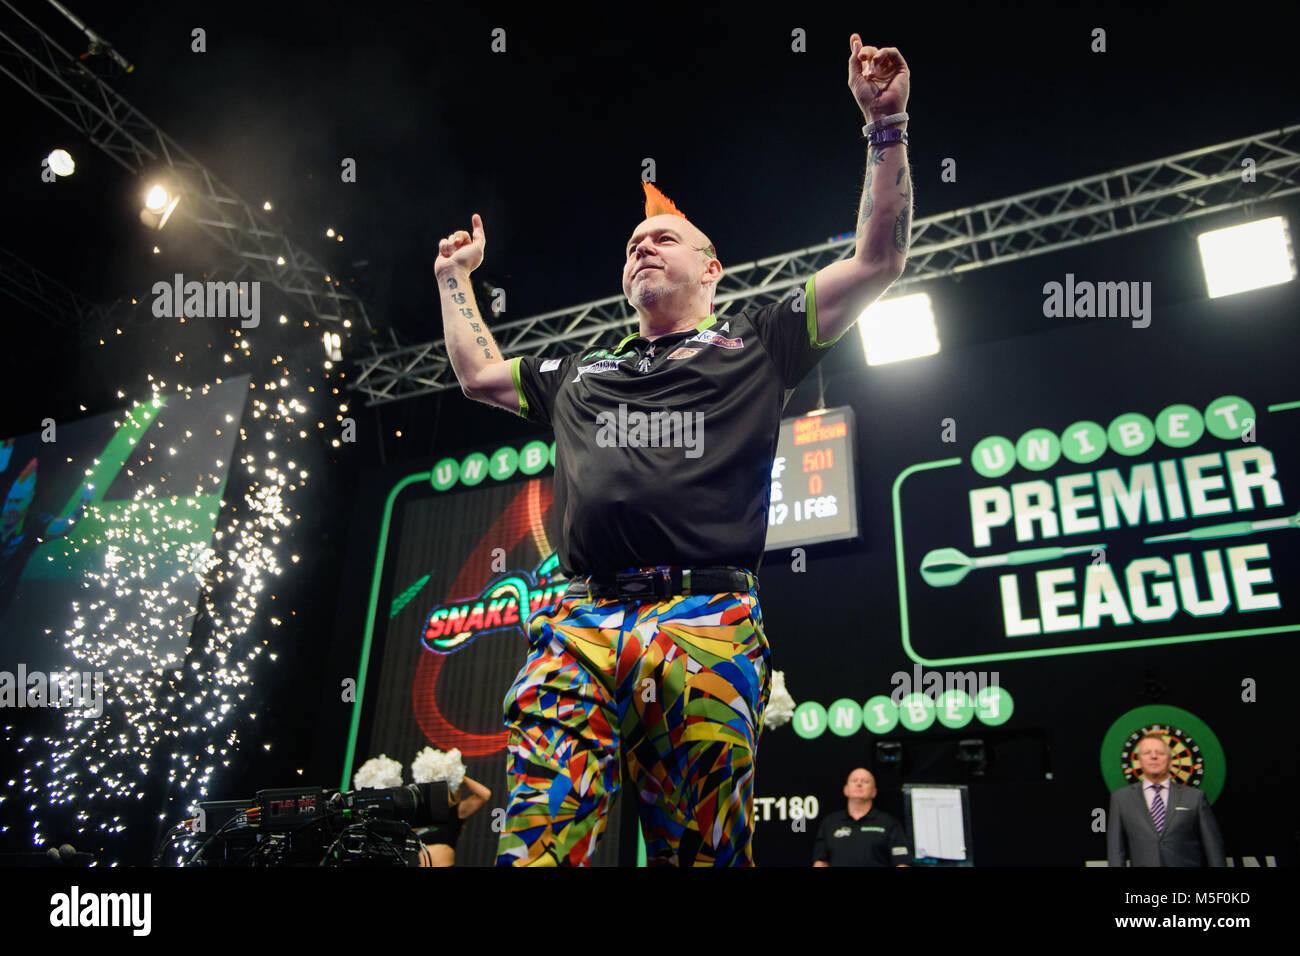 Berlin Germany 22nd Feb 2018 Darts Premier League 4th Match